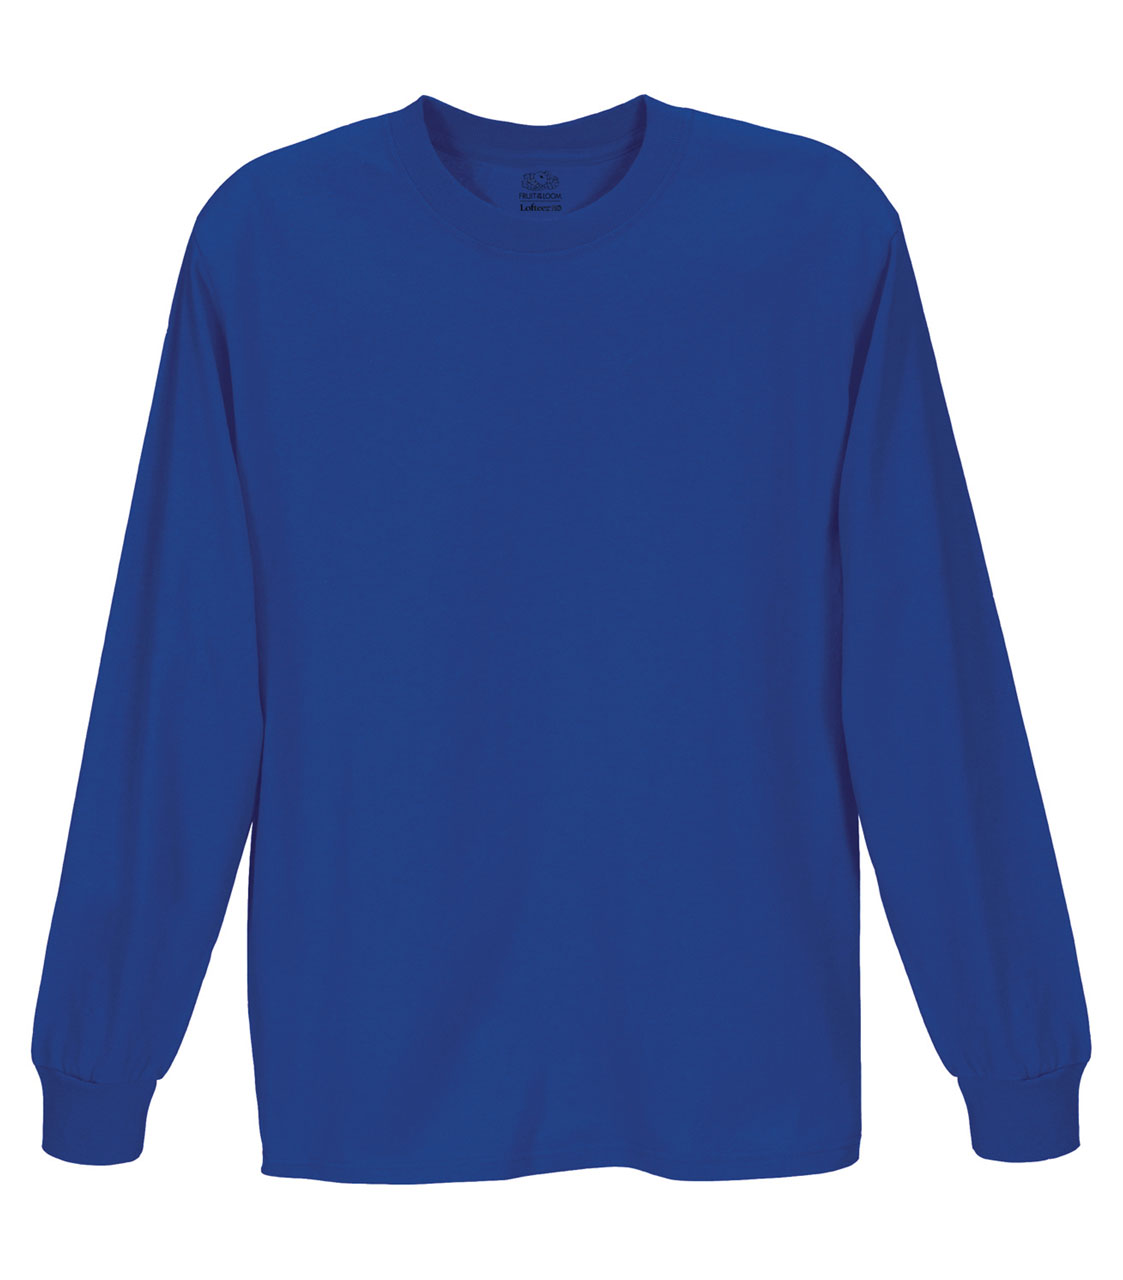 be0412589213 FRUIT OF THE LOOM Long Slve T-Shirt | Custom T-shirts | Entripy